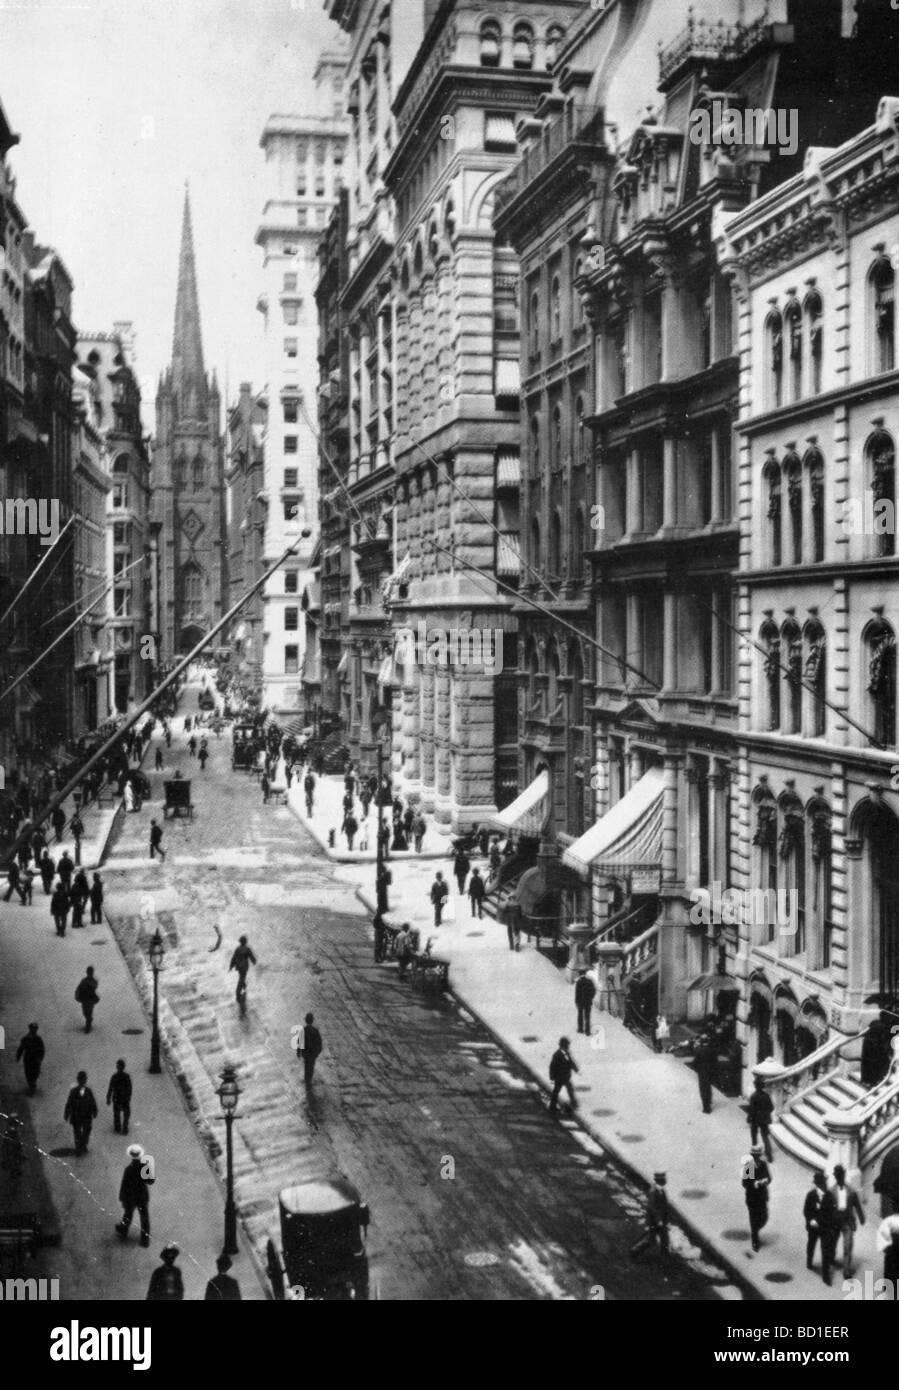 NEW YORK 1898 - Wall Street looking towards Trinity Church on Broadway - Stock Image